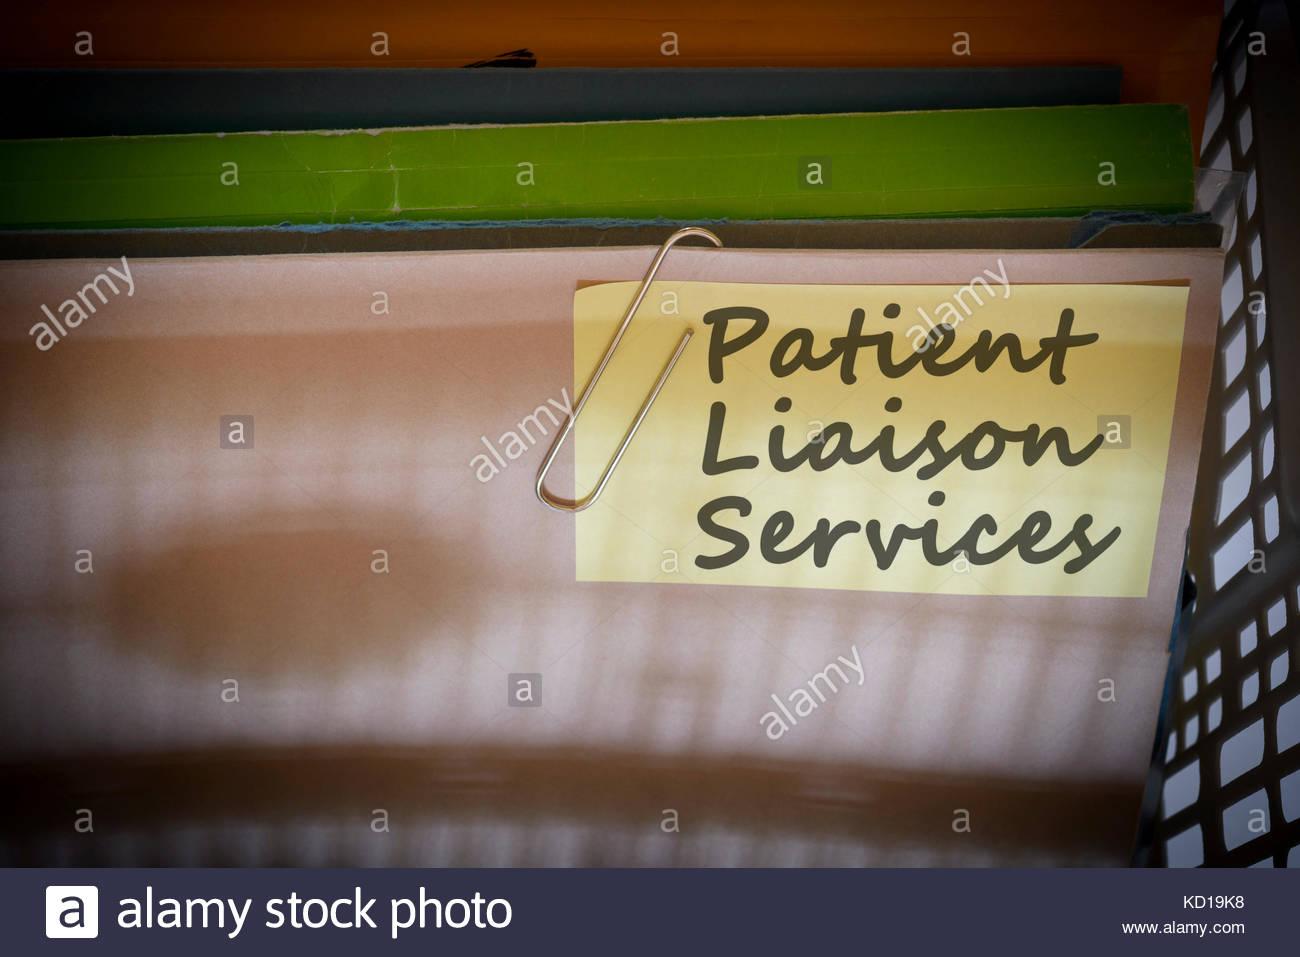 Patient Liaison Services written on document folder, Dorset, England. - Stock Image